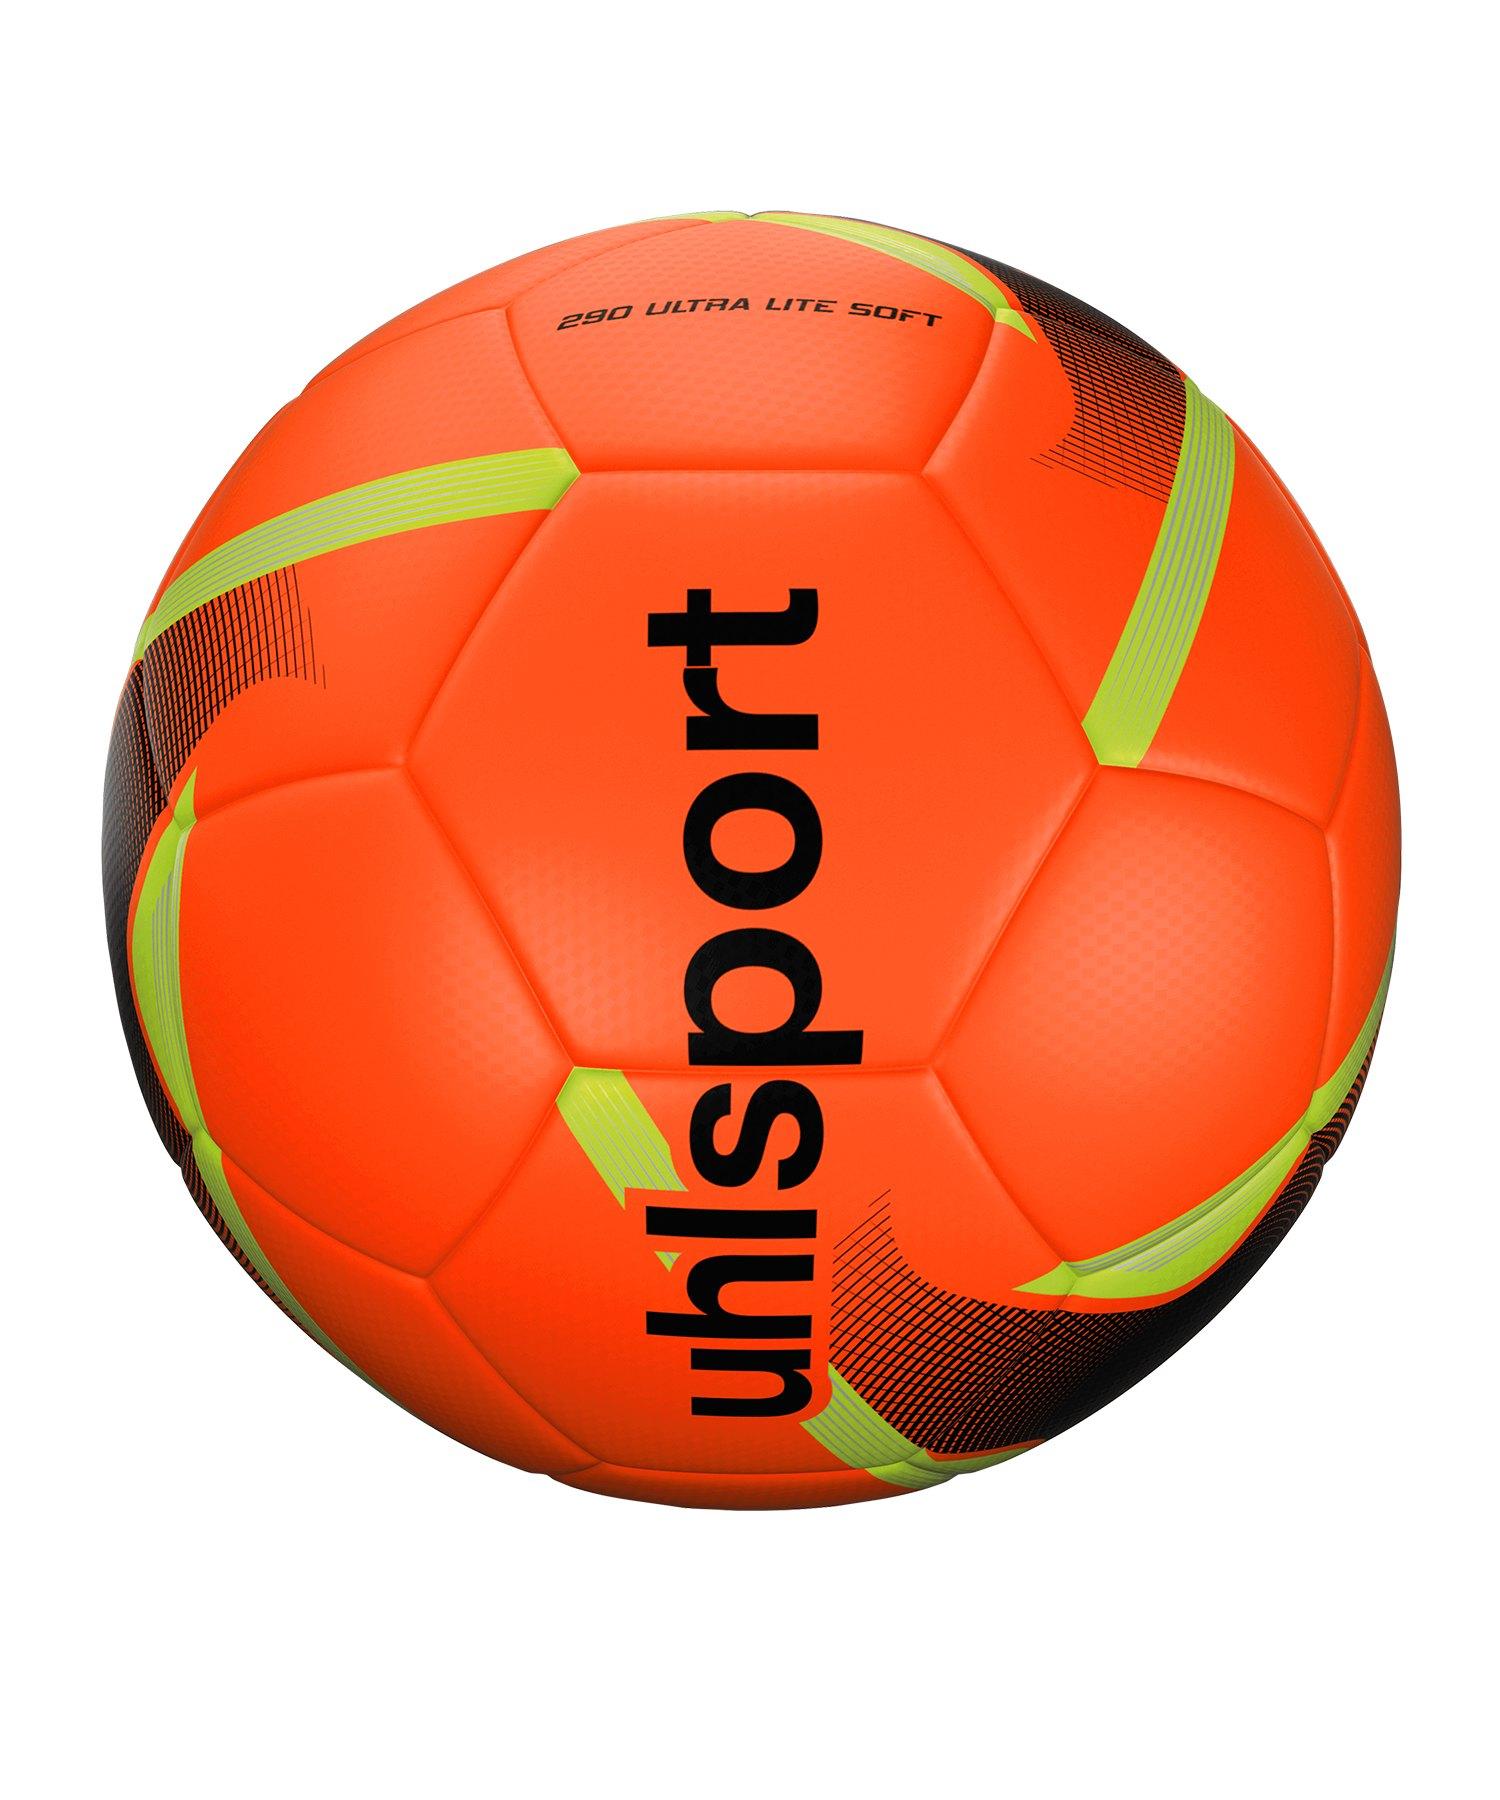 Uhlsport Infinity 290 Ultra Lite Soft Fussball F01 - orange